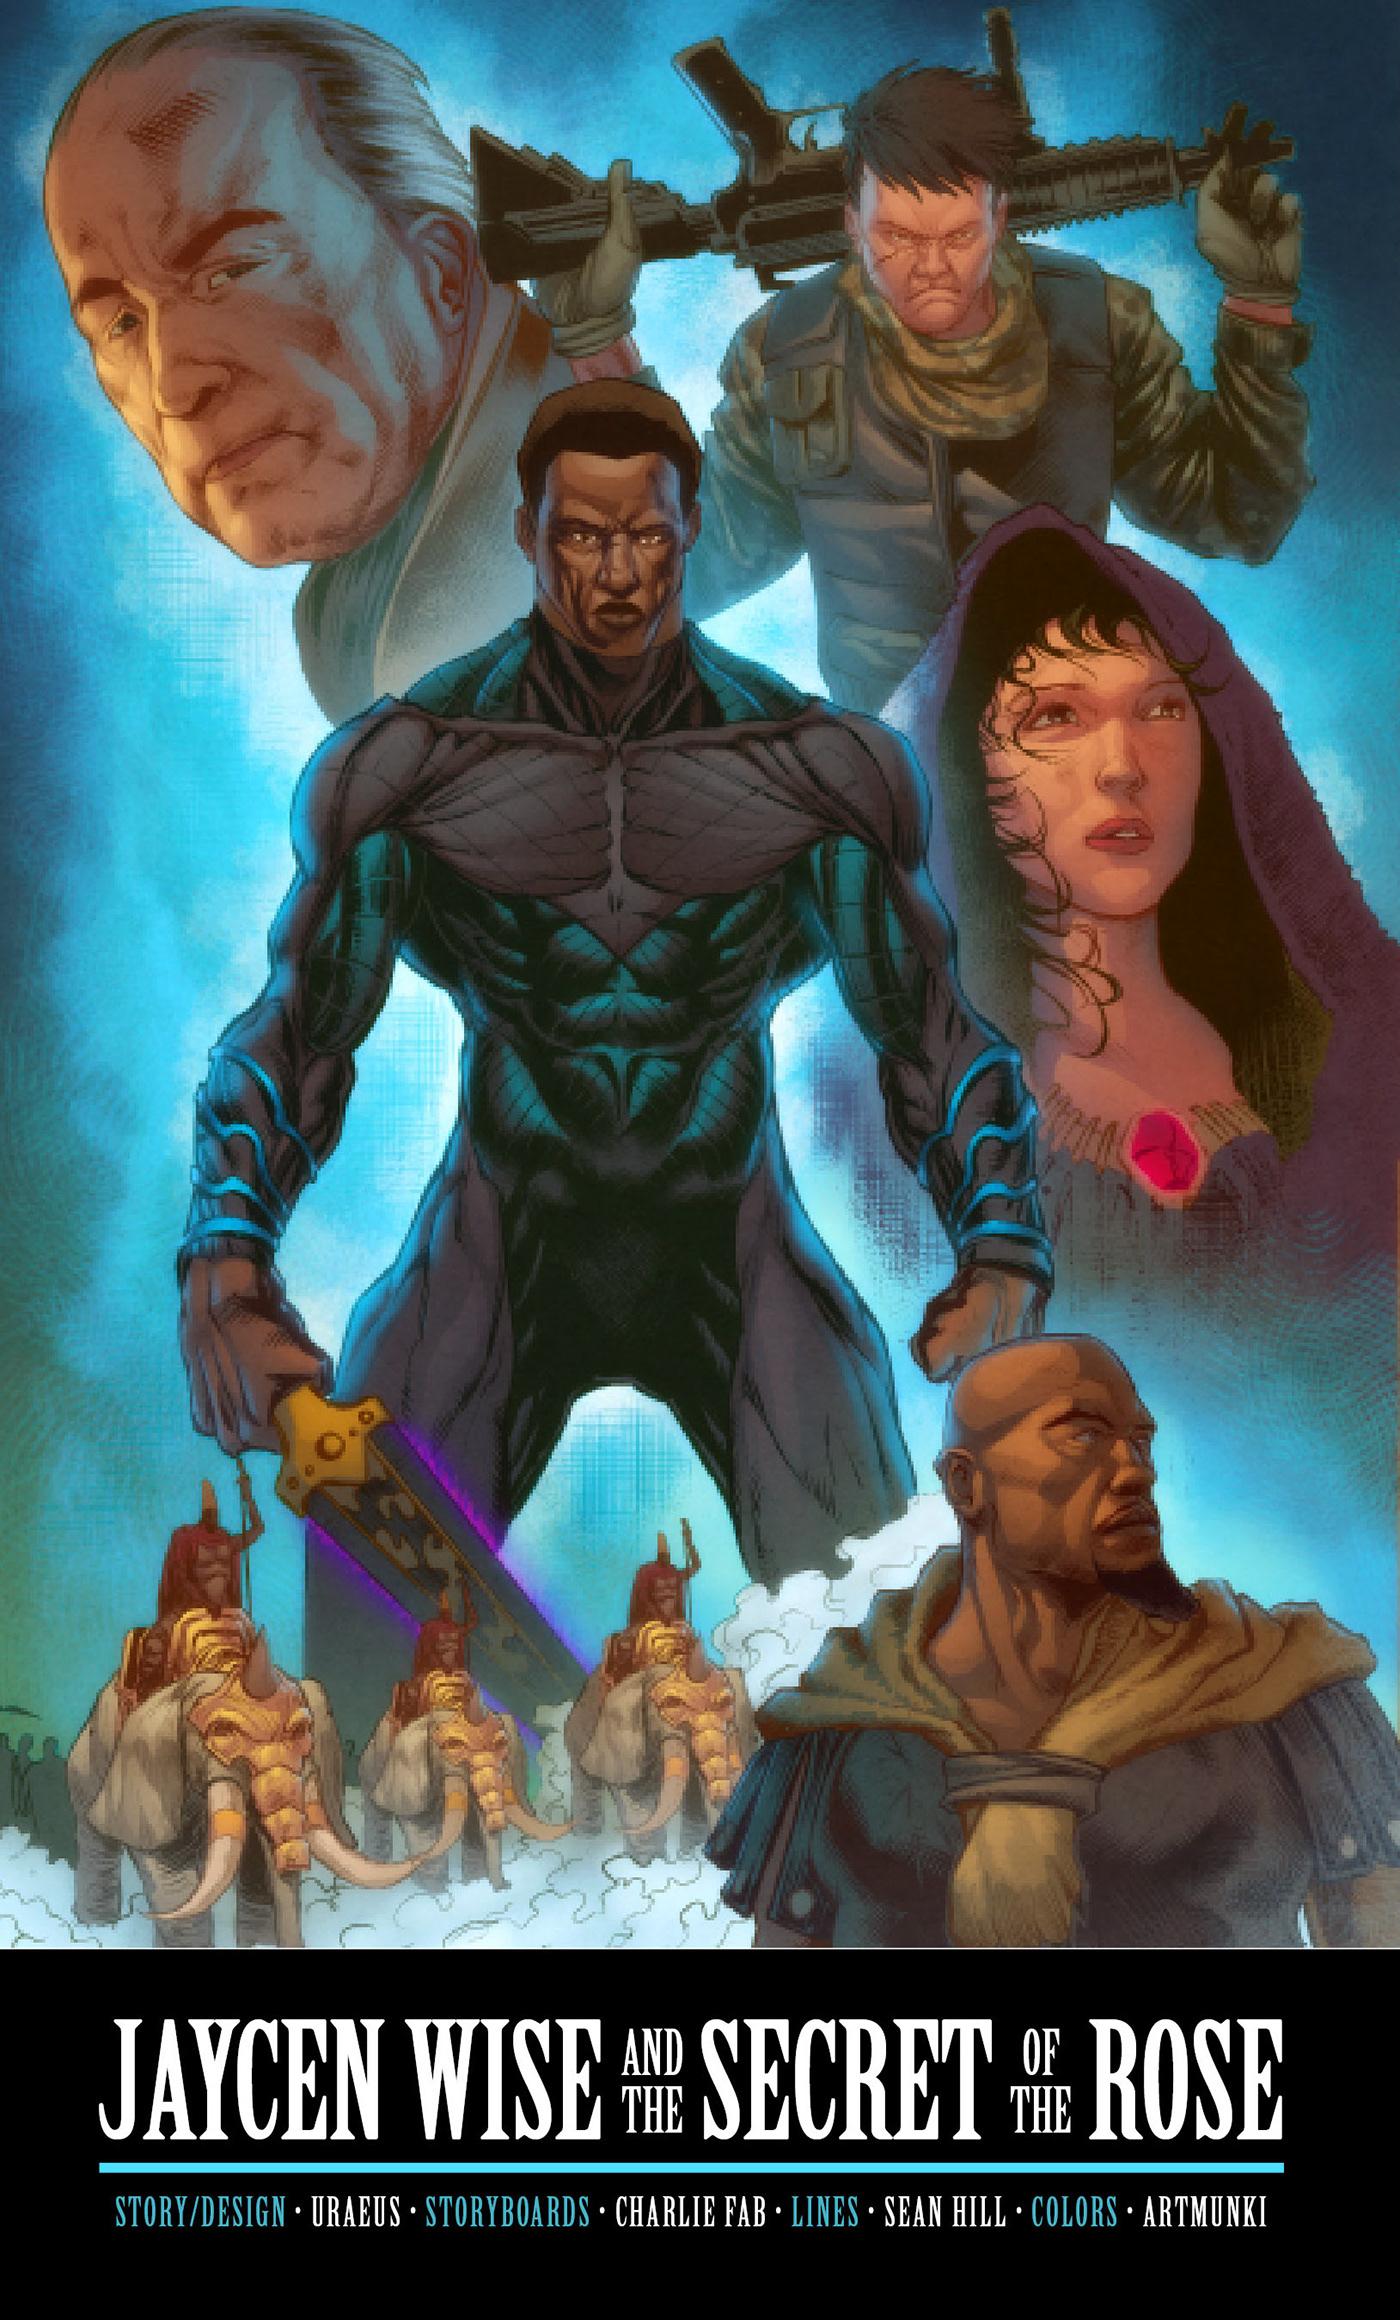 jaycen wise adventure comic comics Hero superheroes